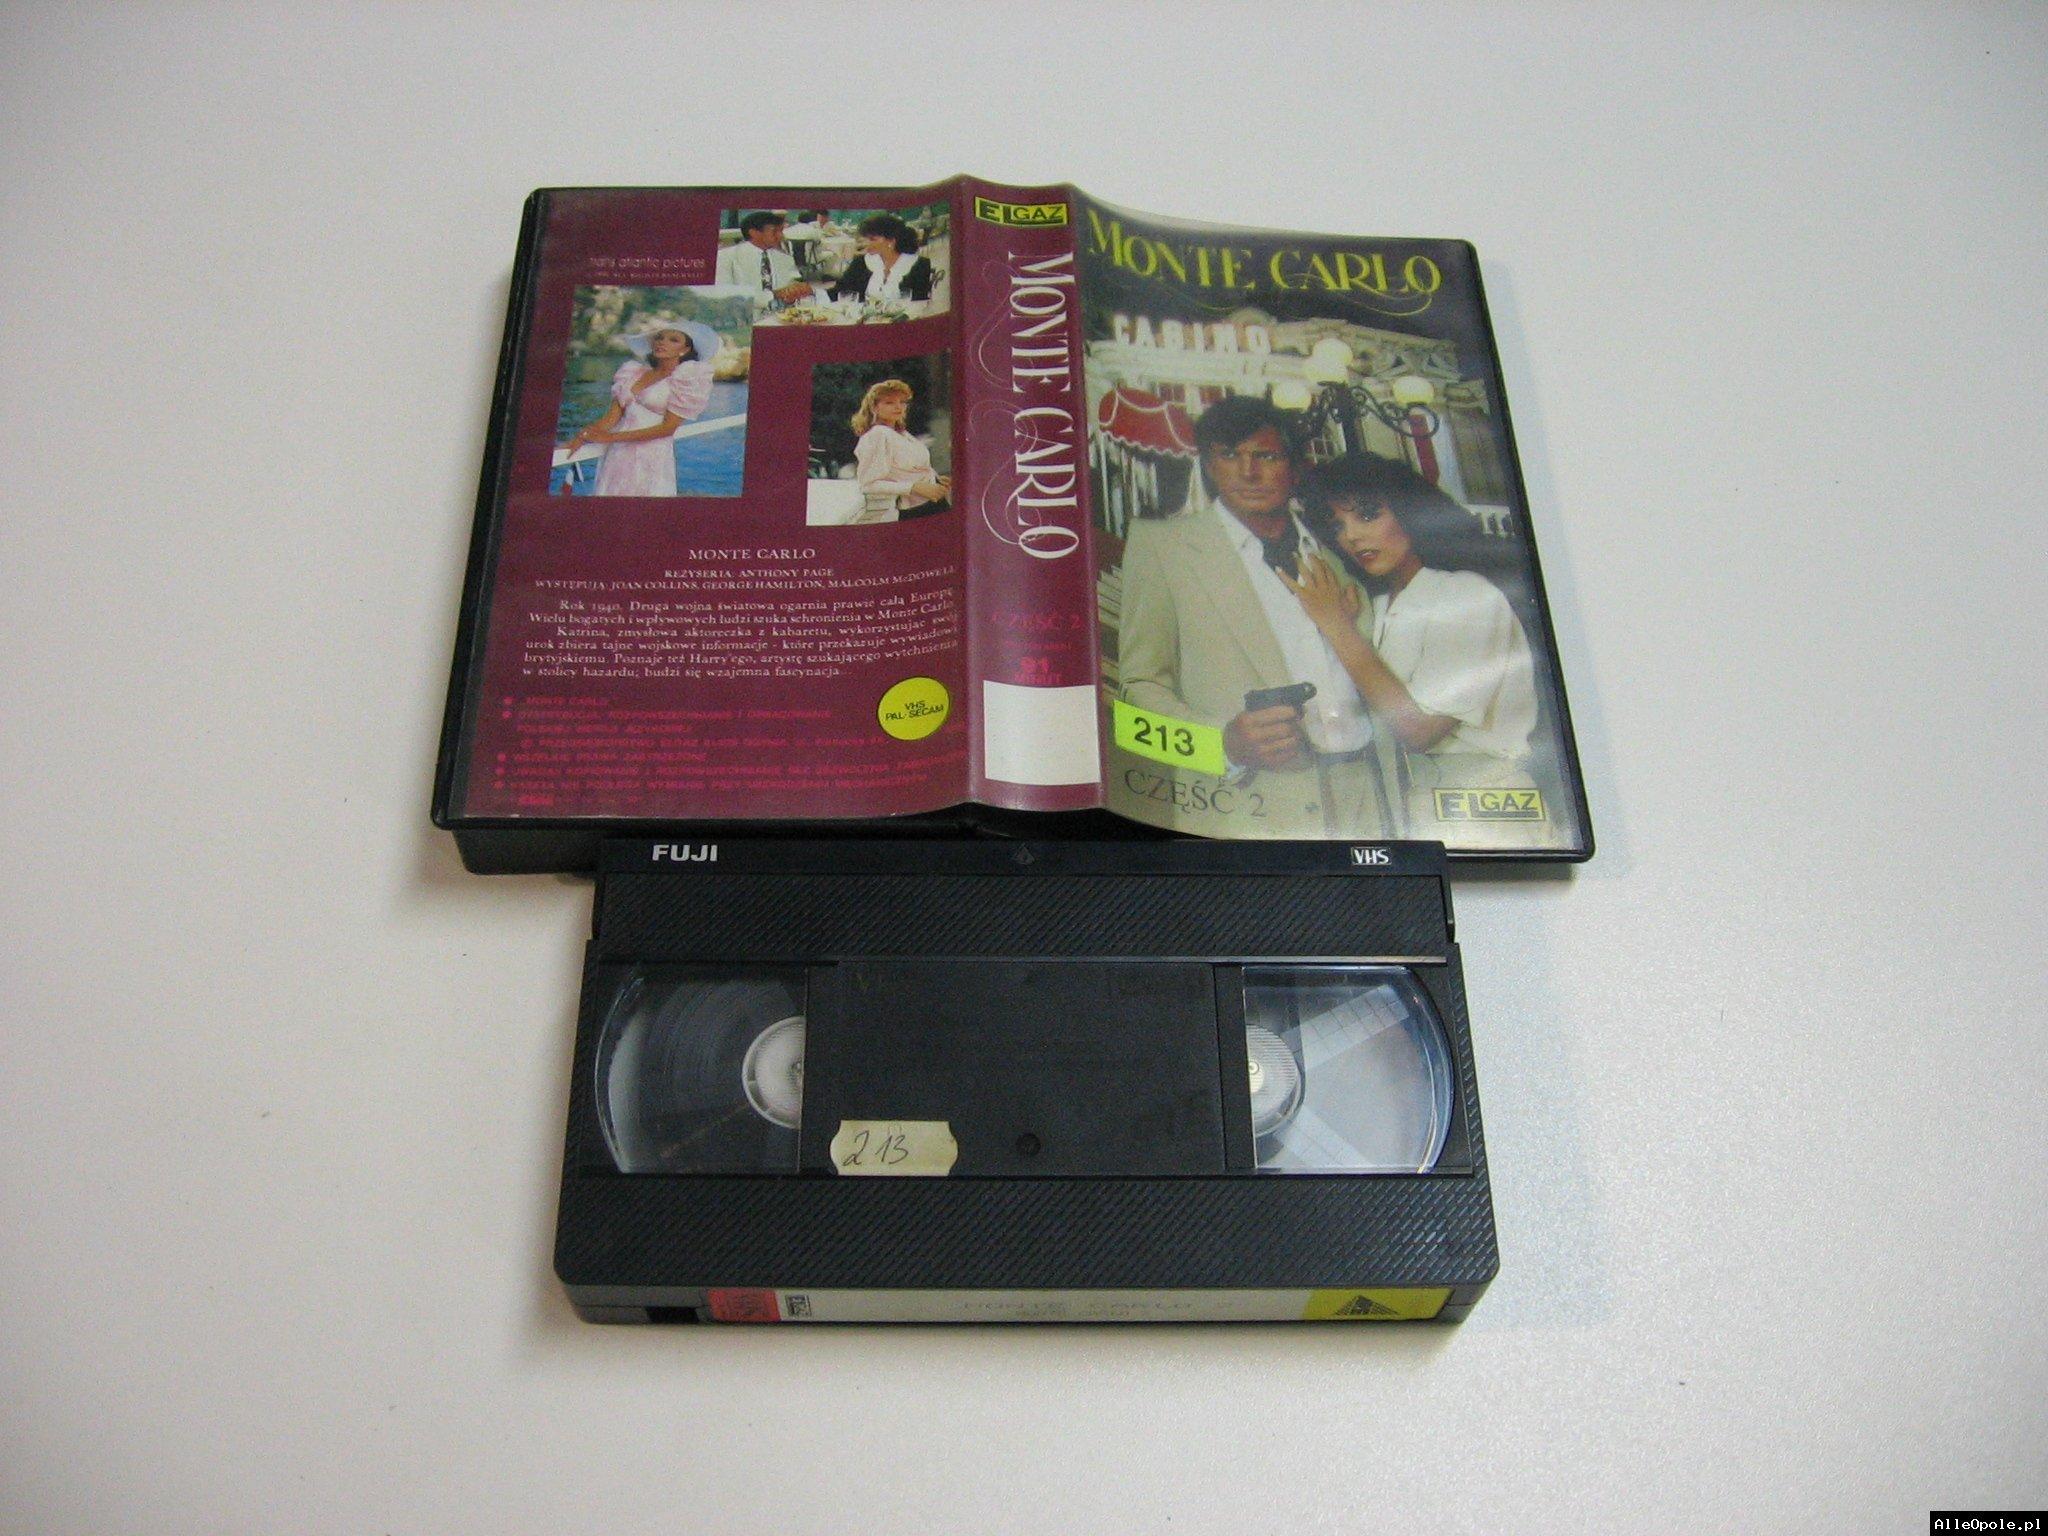 MONTE CARLO 2 - VHS Kaseta Video - Opole 1842